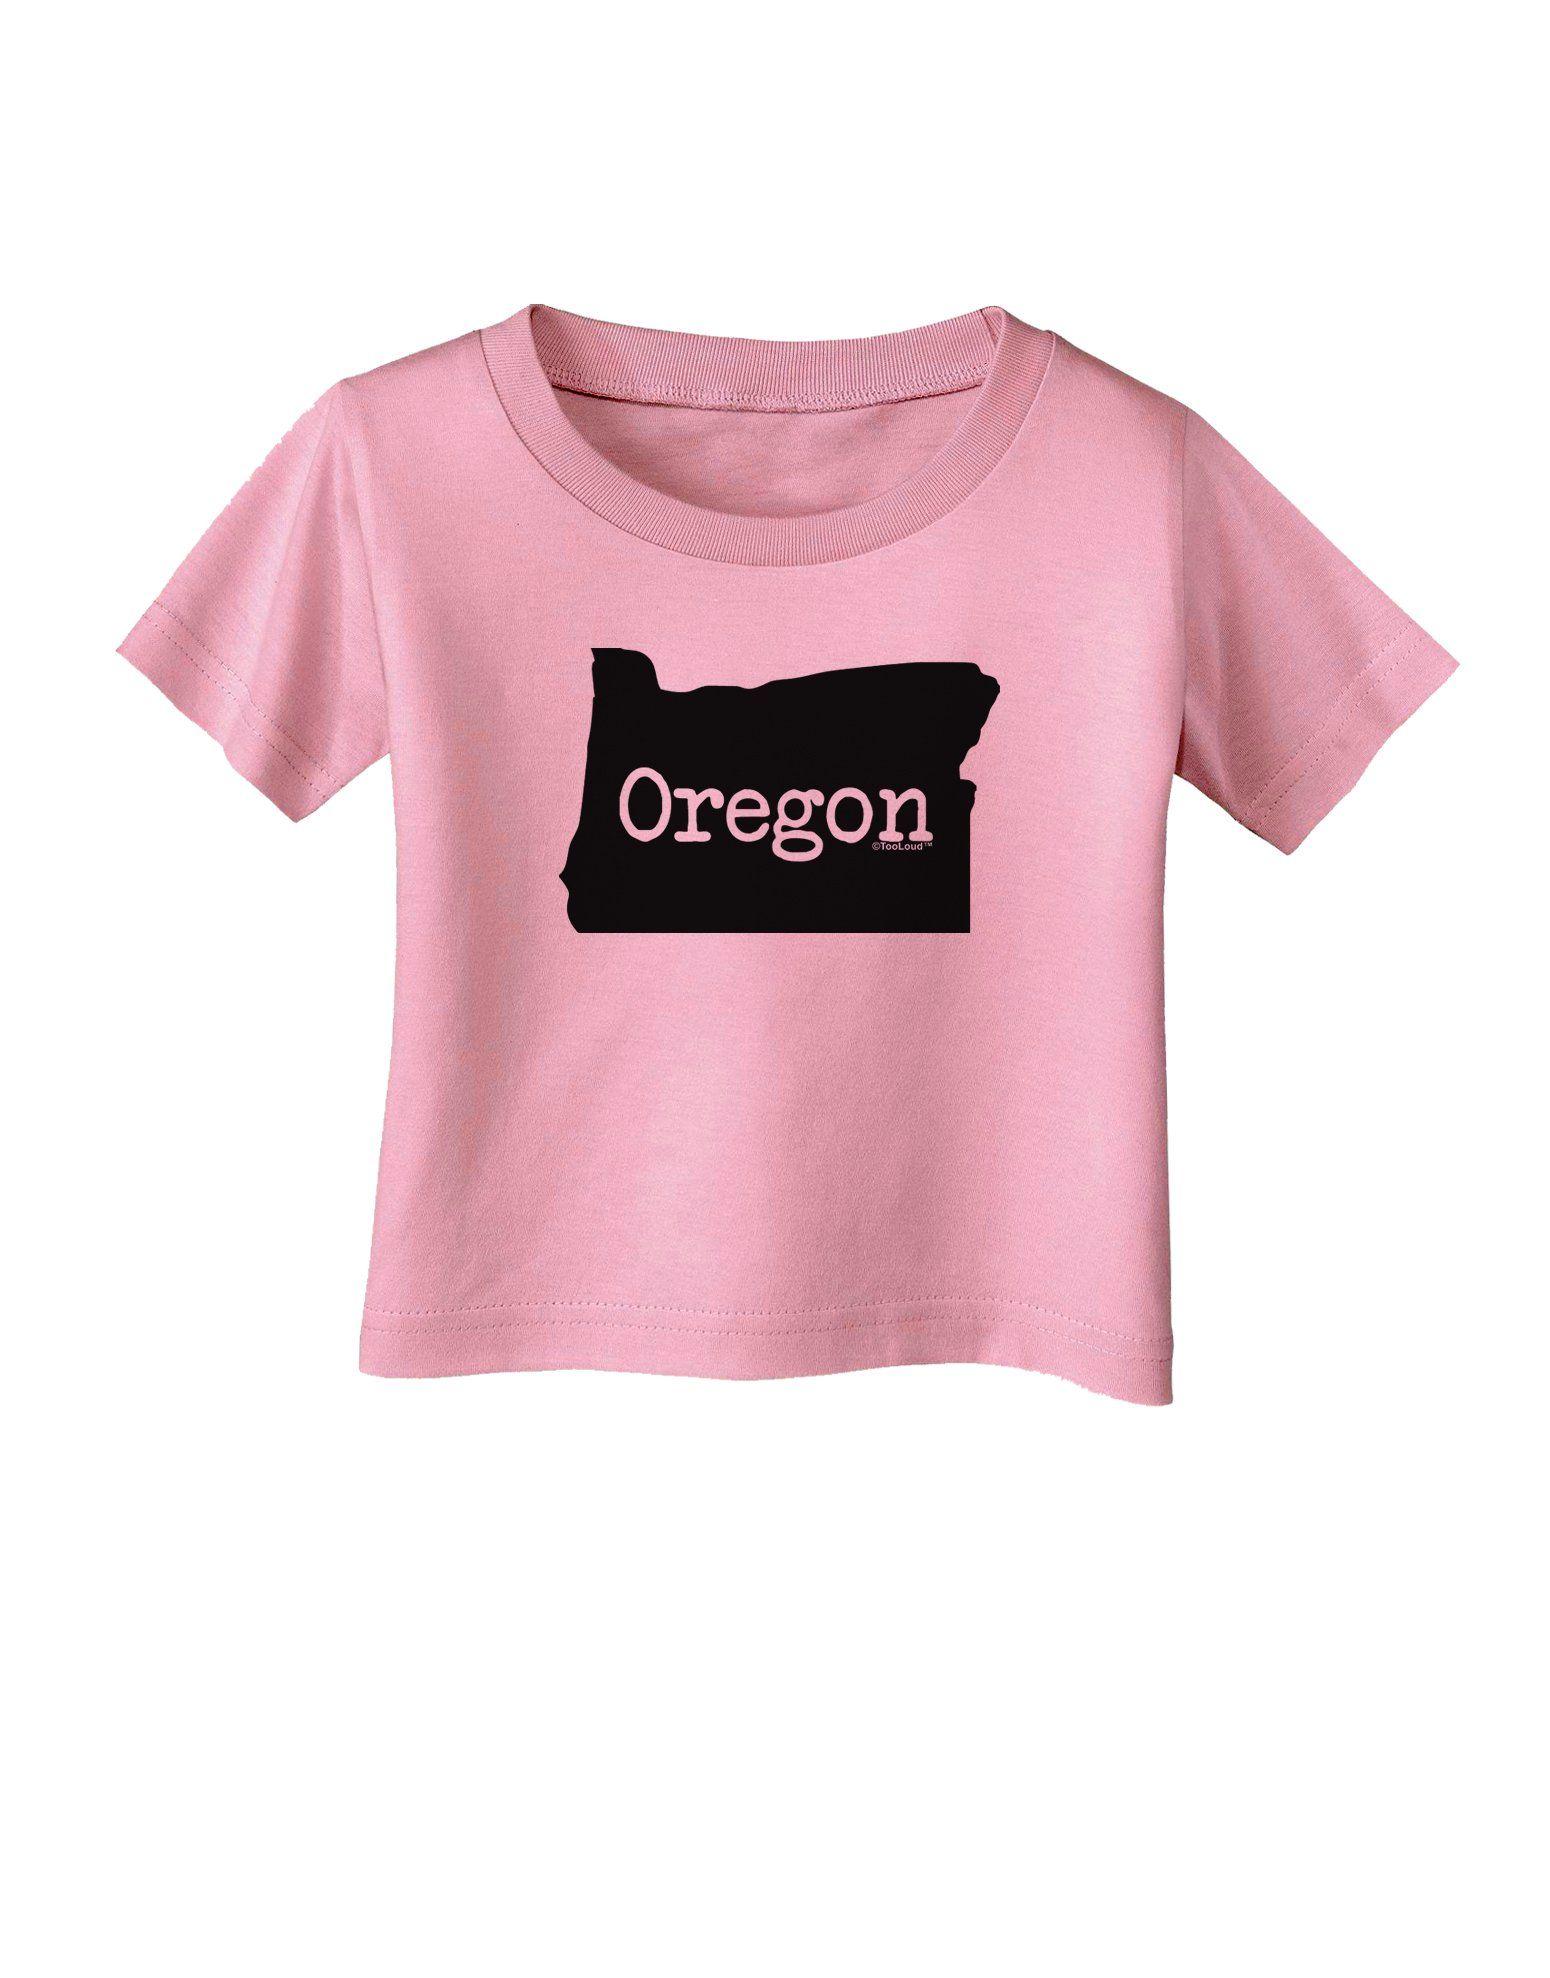 Oregon - United States Shape Infant T-Shirt by TooLoud